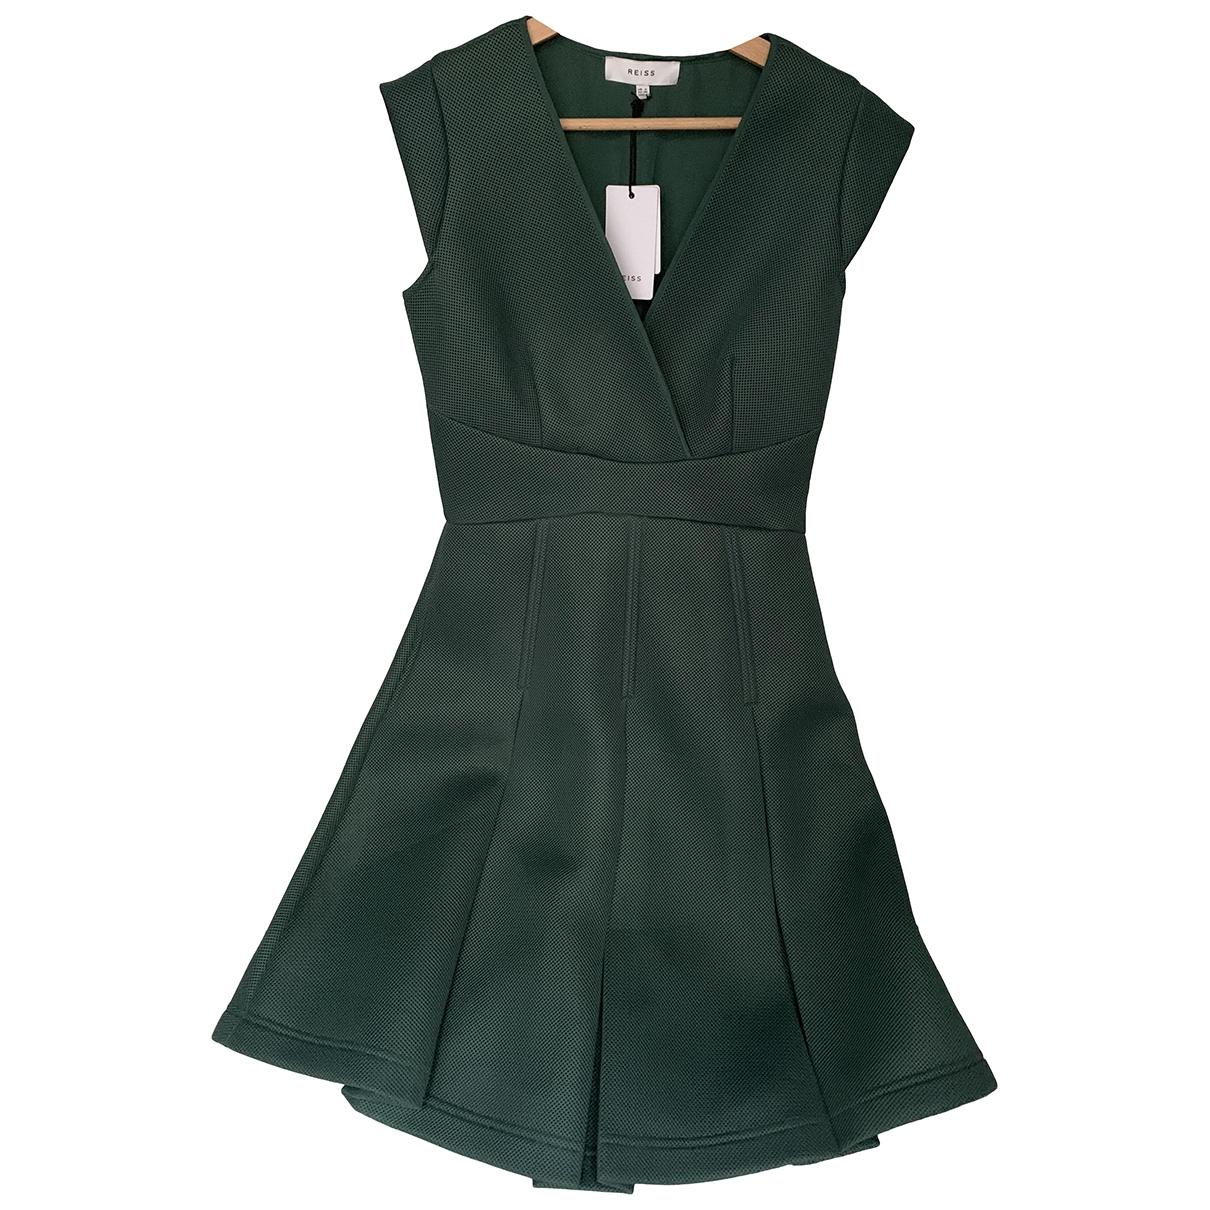 Reiss \N Kleid in  Gruen Polyester